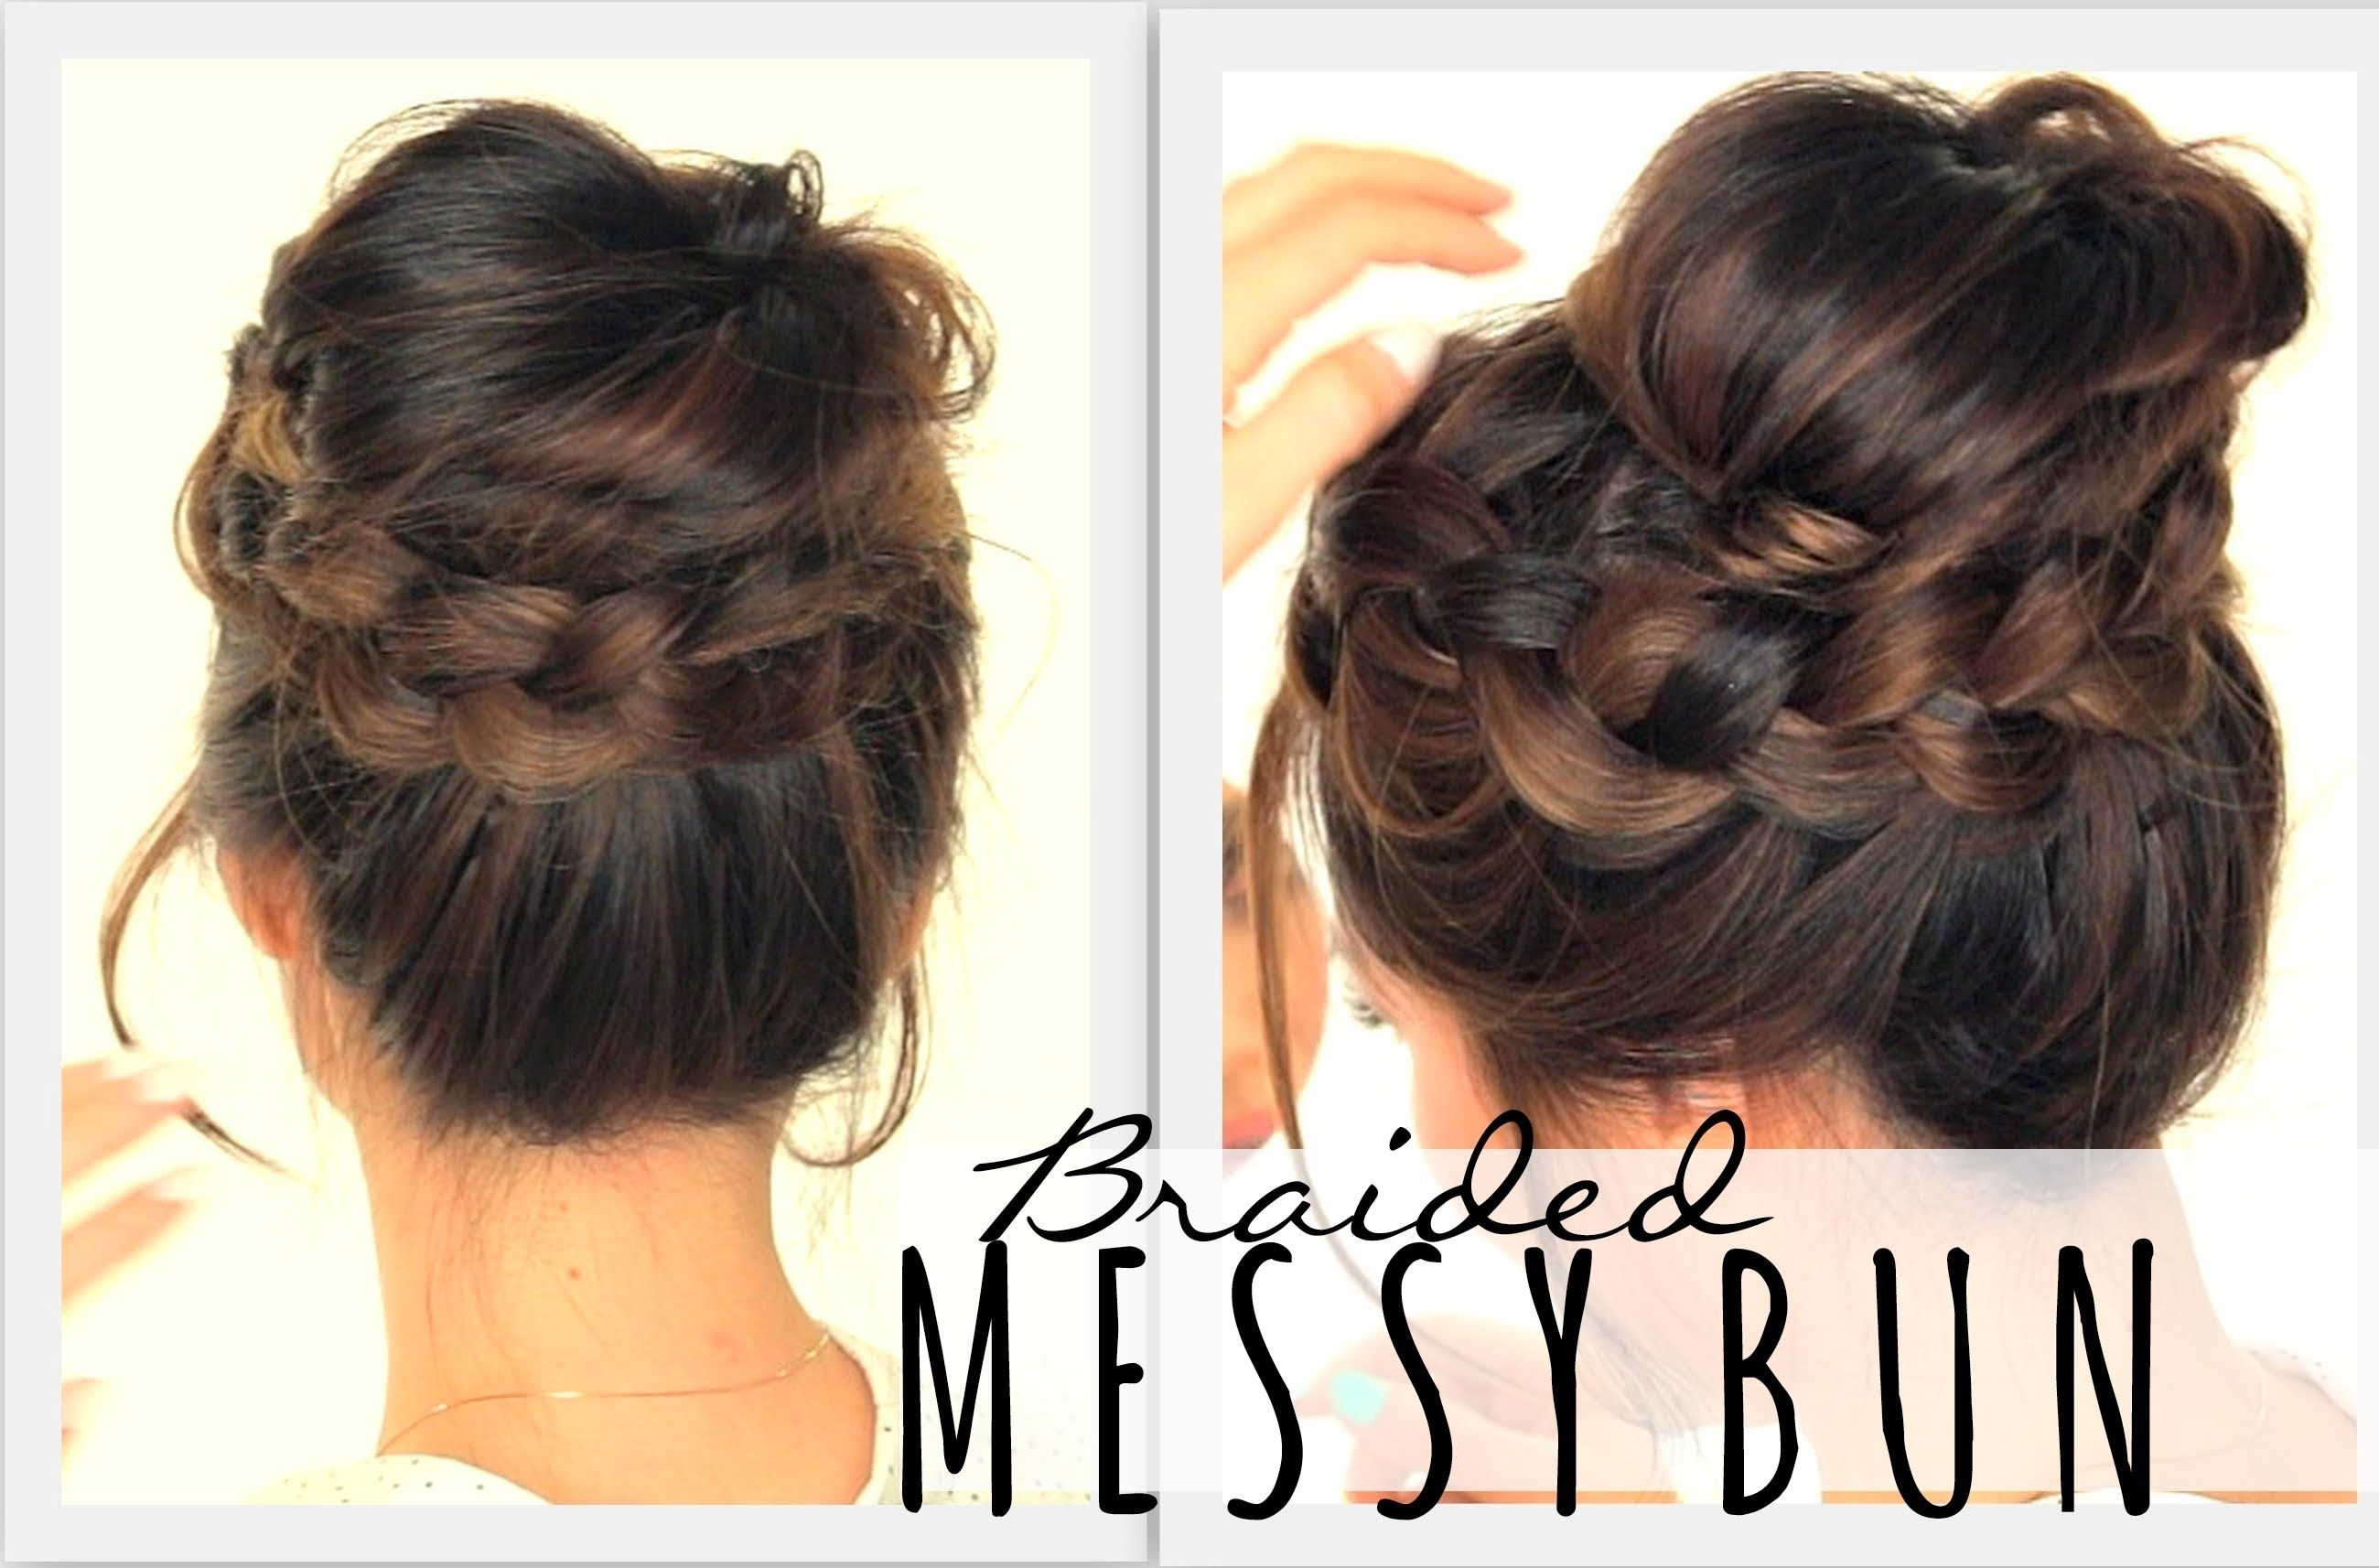 Ndday hairstyles messy bun crown braid hair tutorial